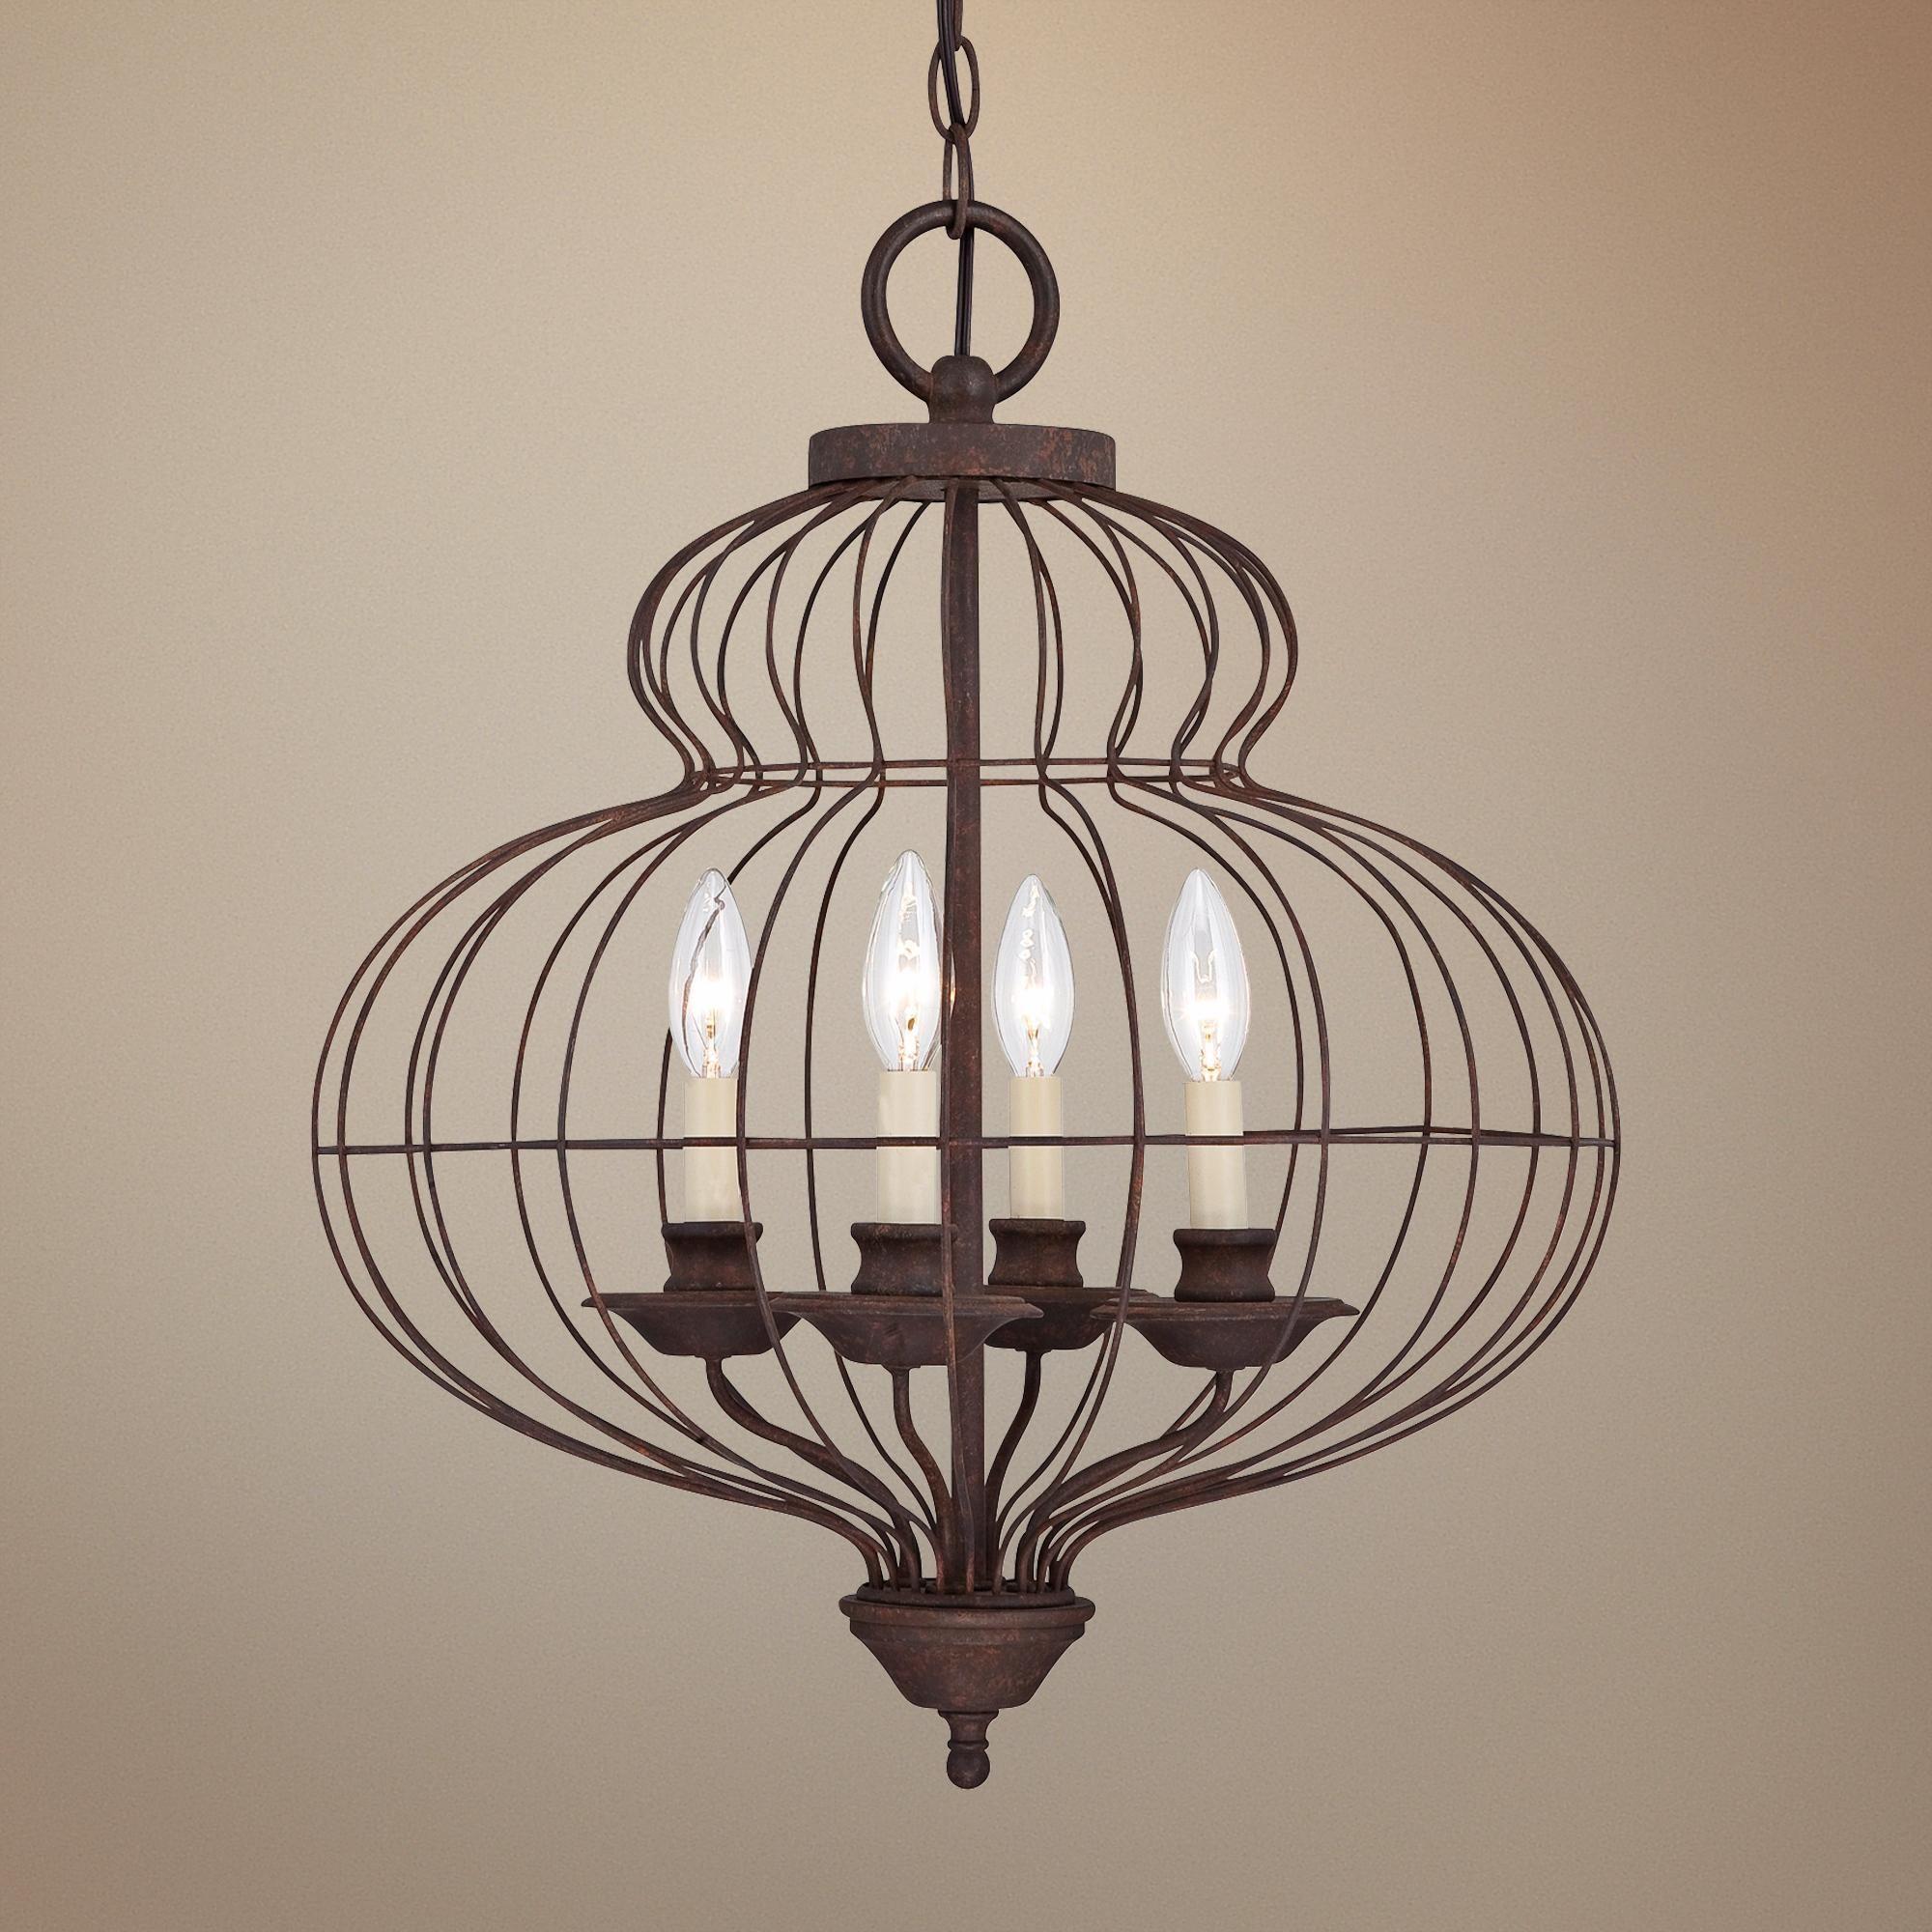 "Quoizel Laila 19"" Wide 4 Light Cage Chandelier"